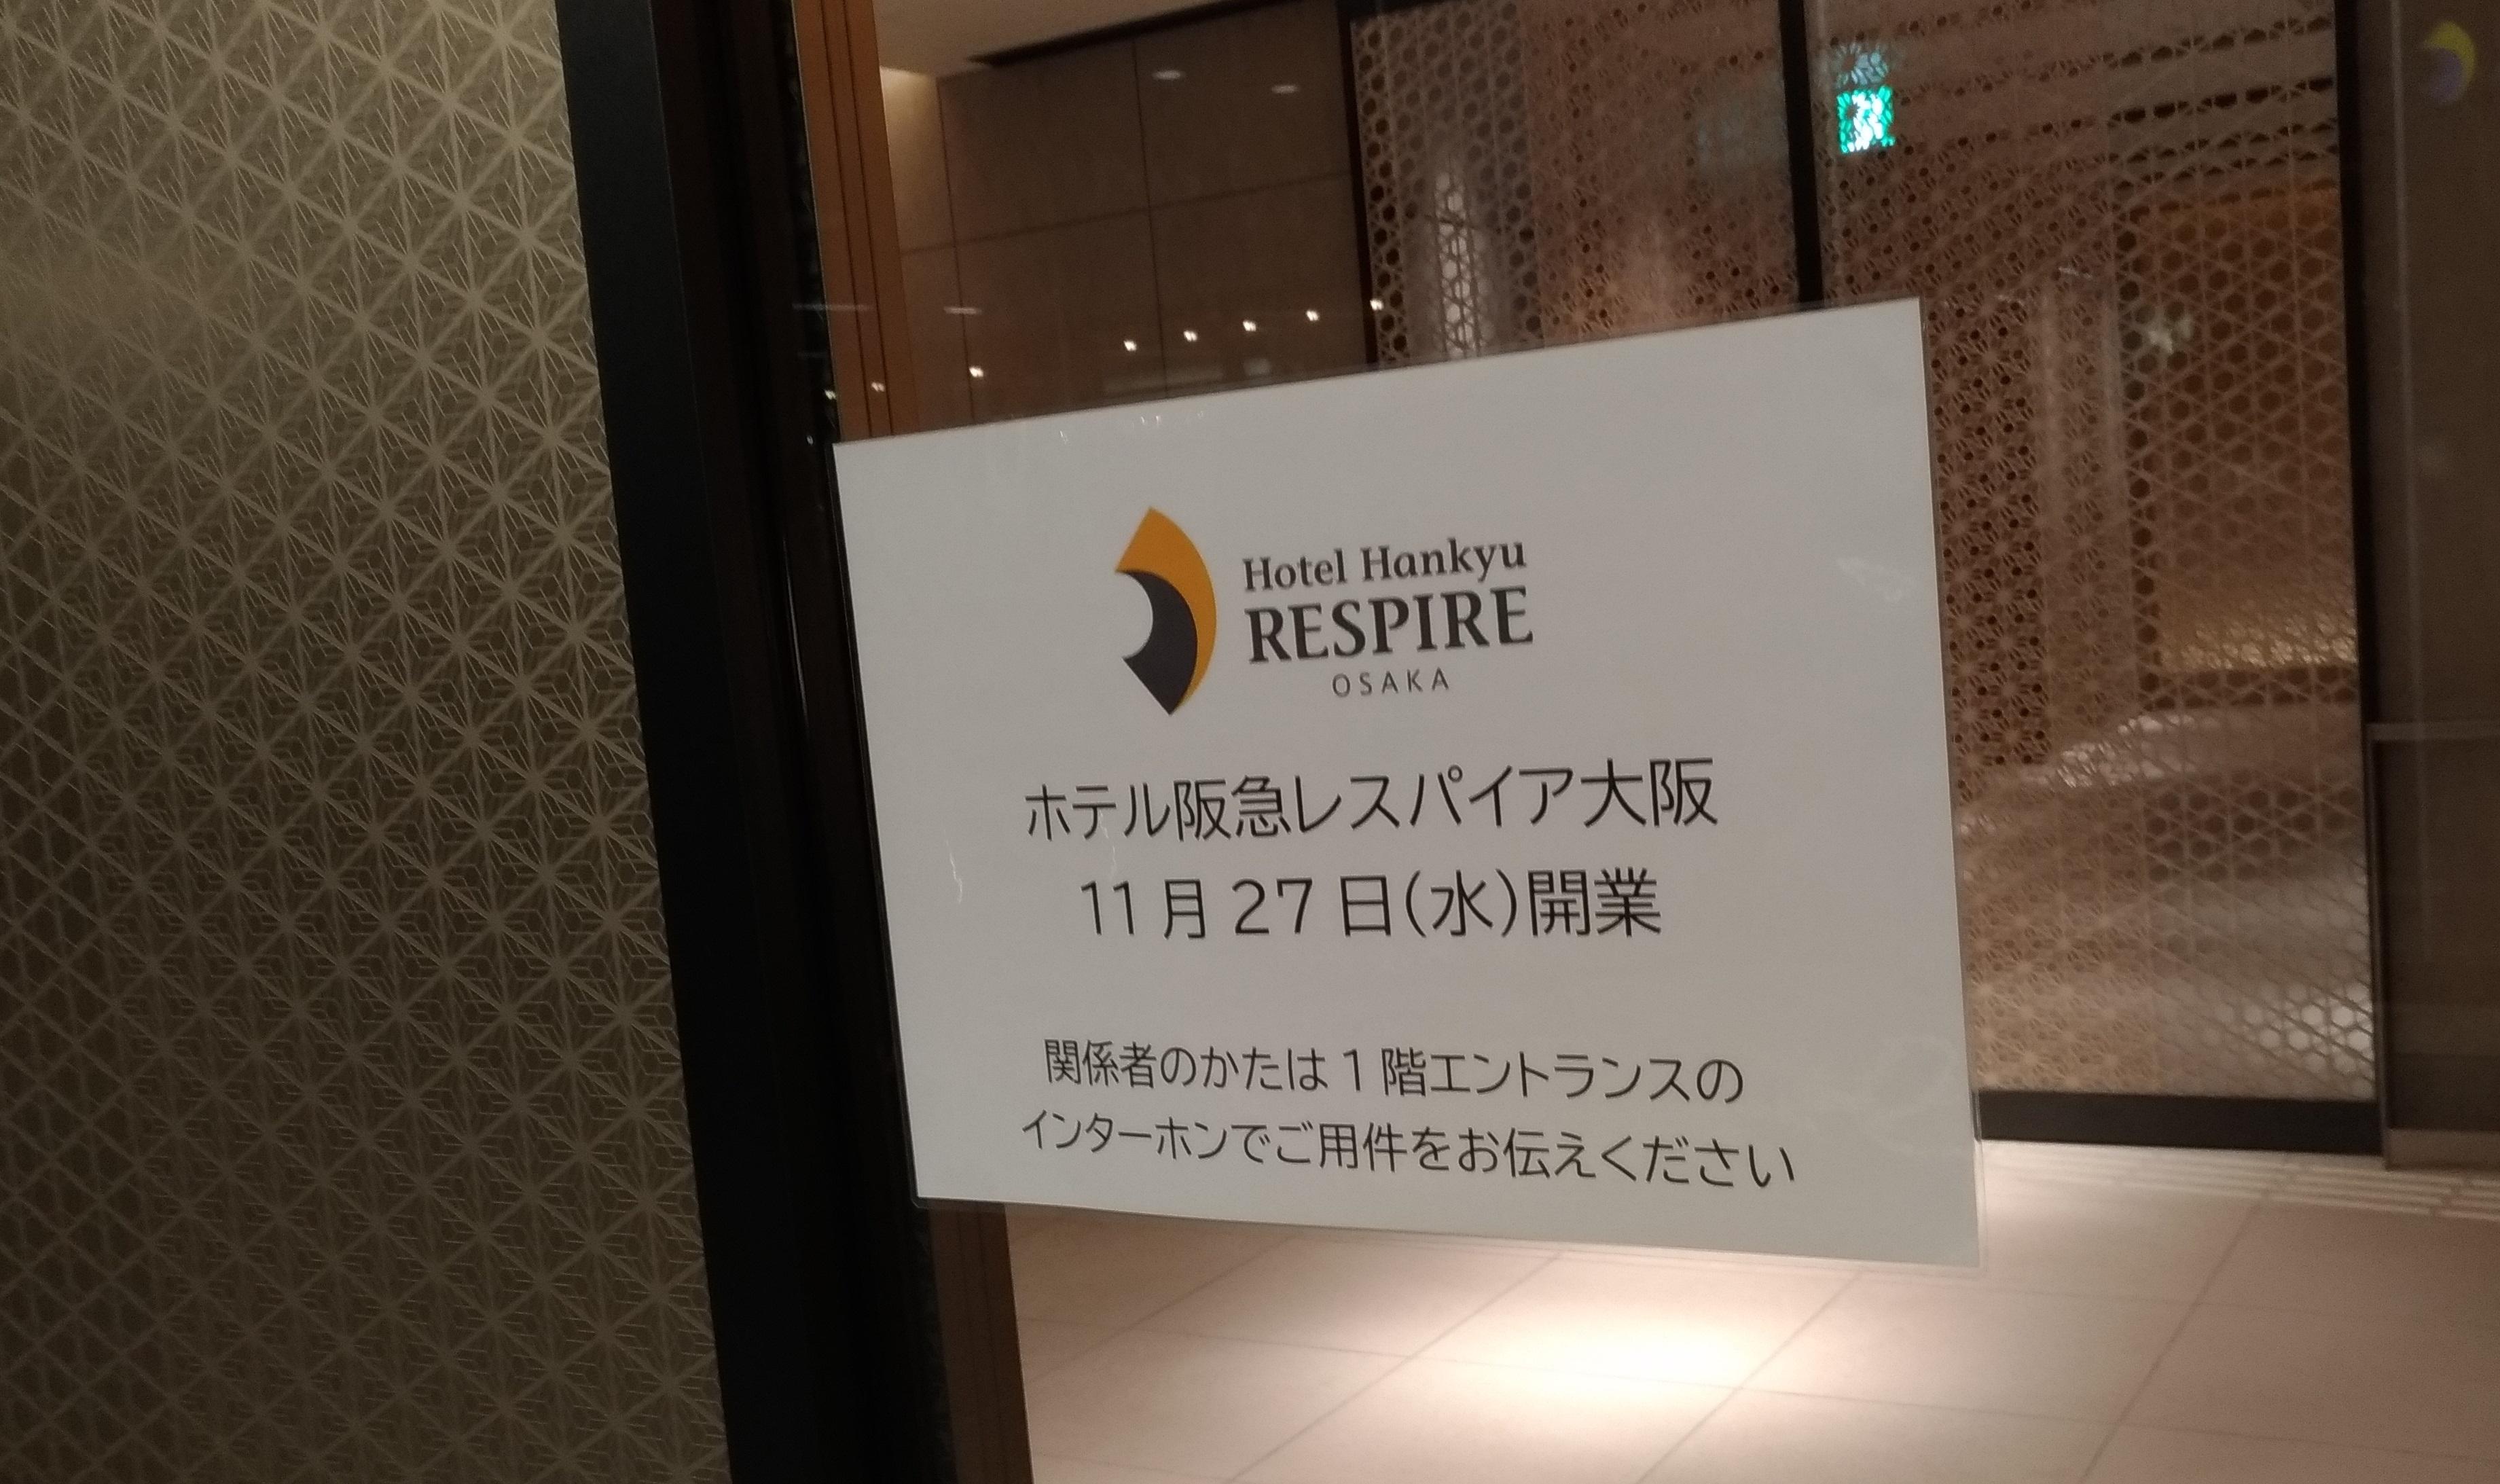 osaka_hotel_linksumeda_respire_2.jpg